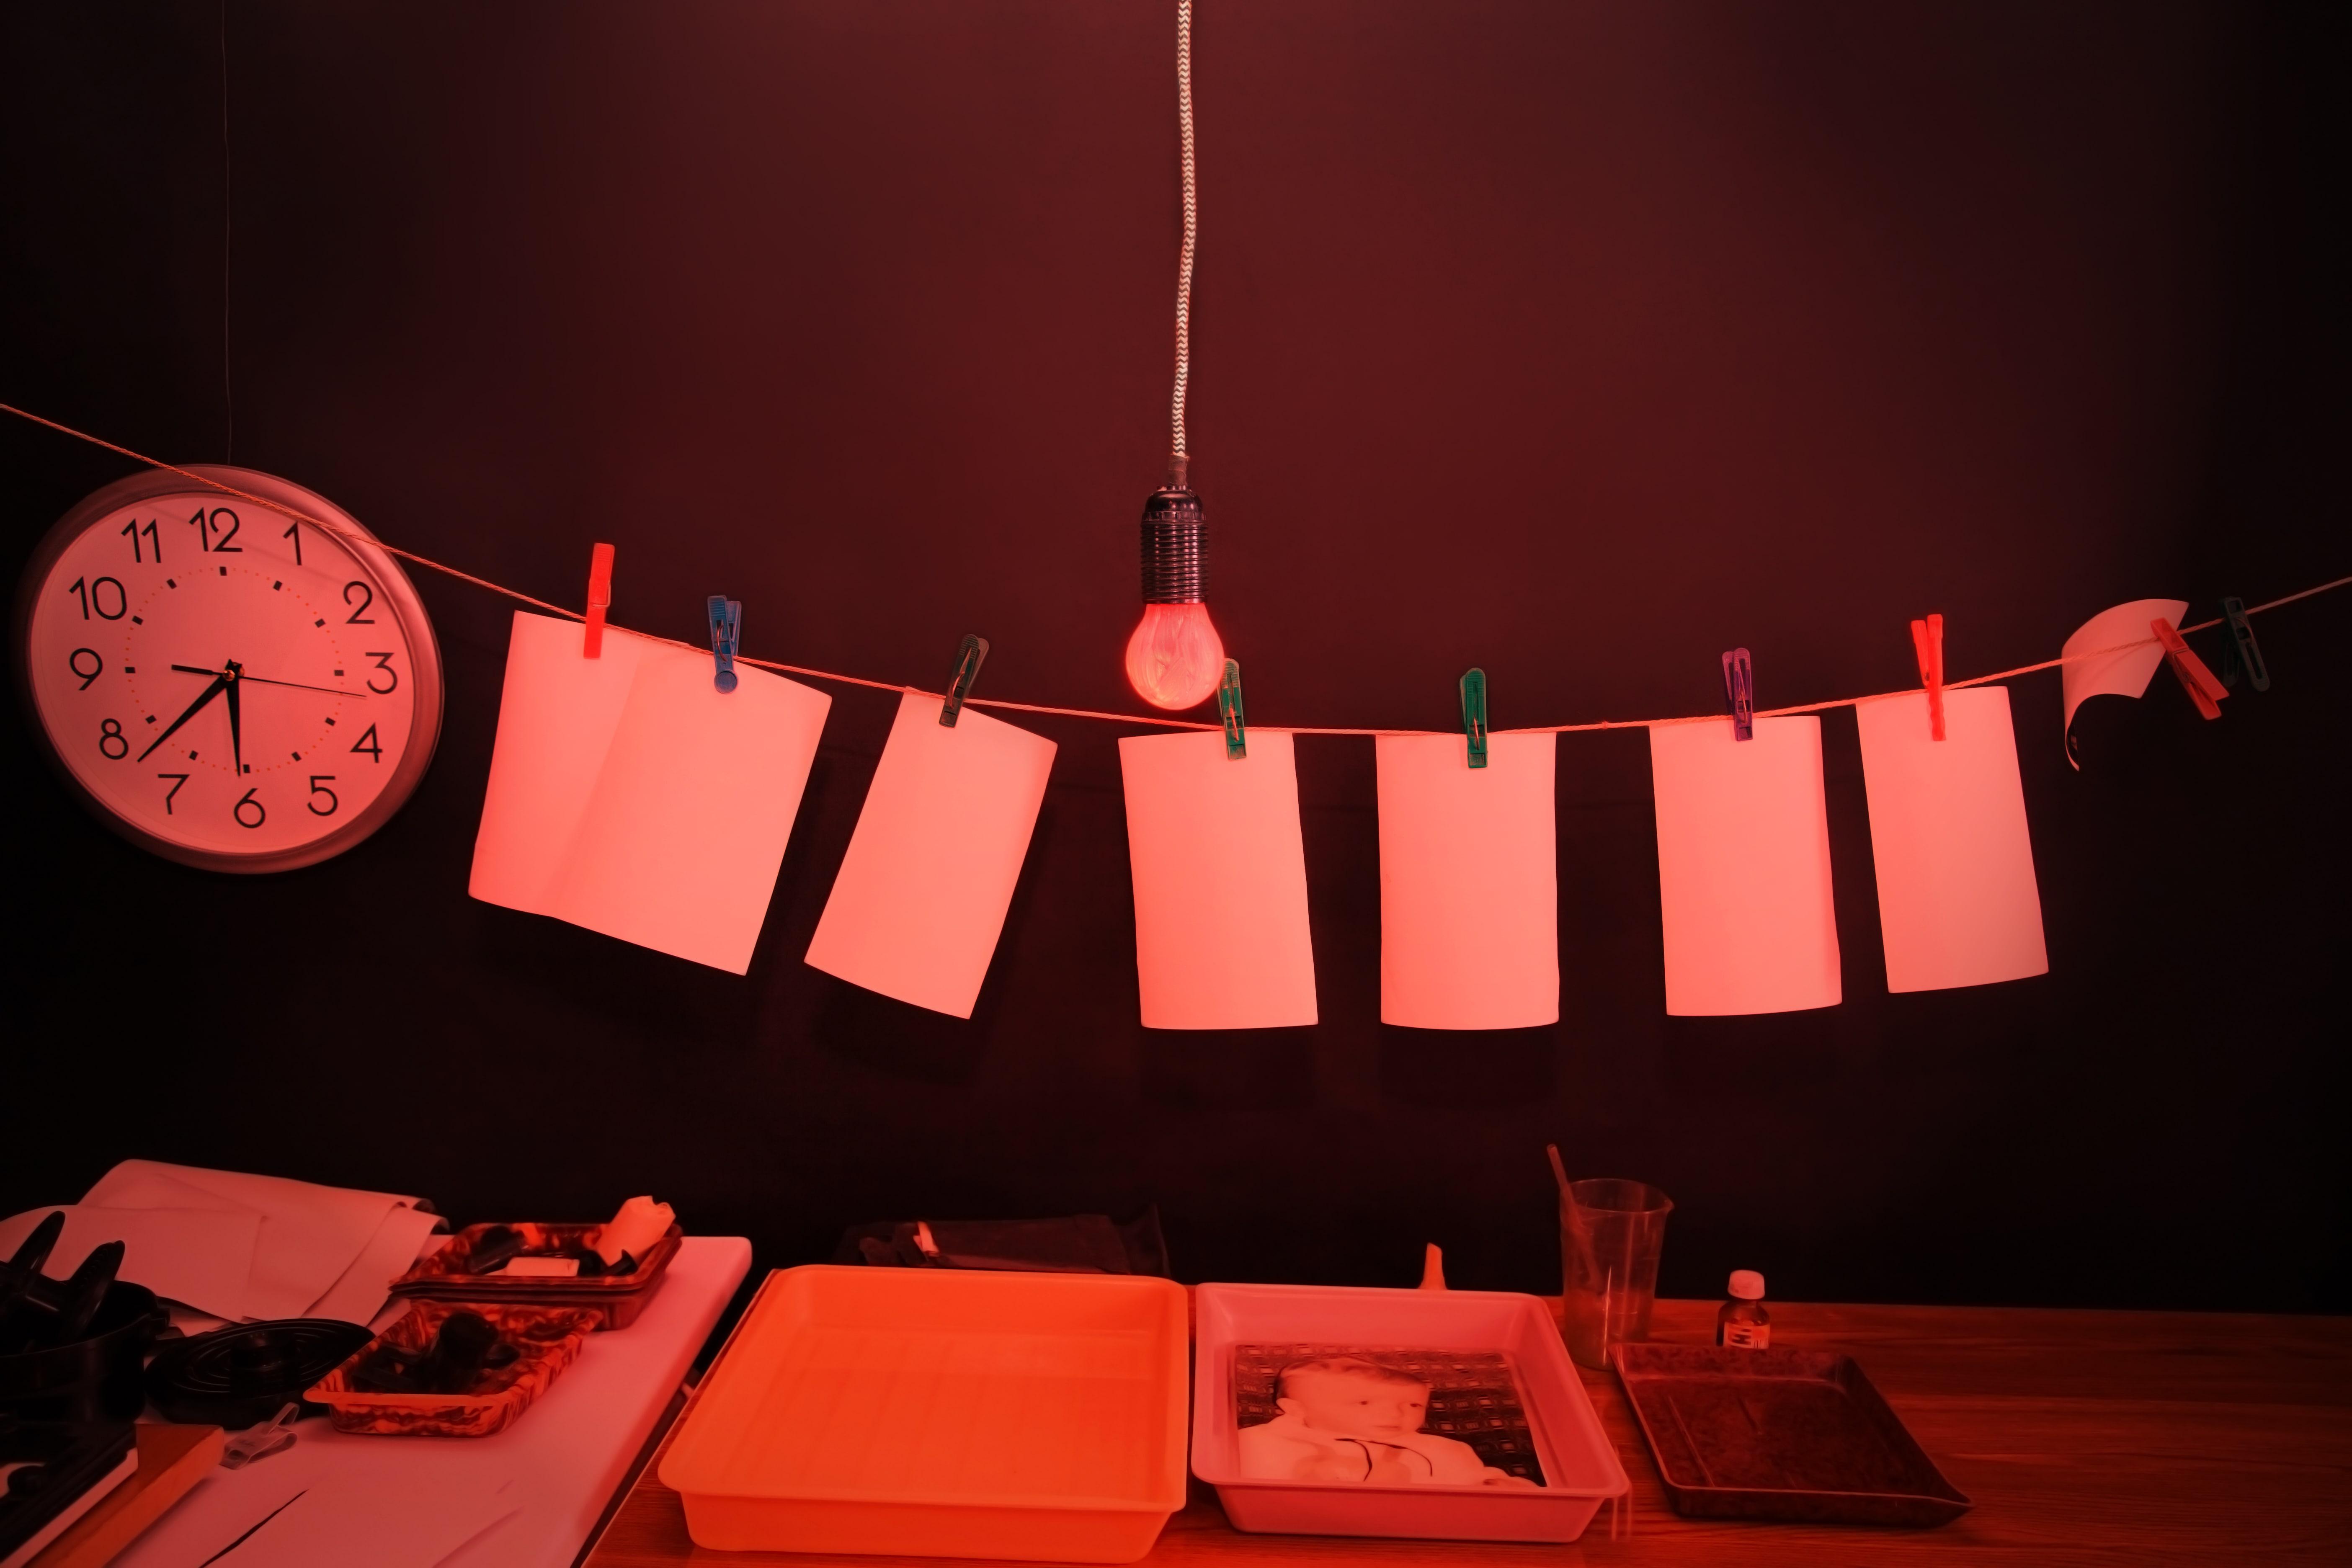 Dormroom Darkroom